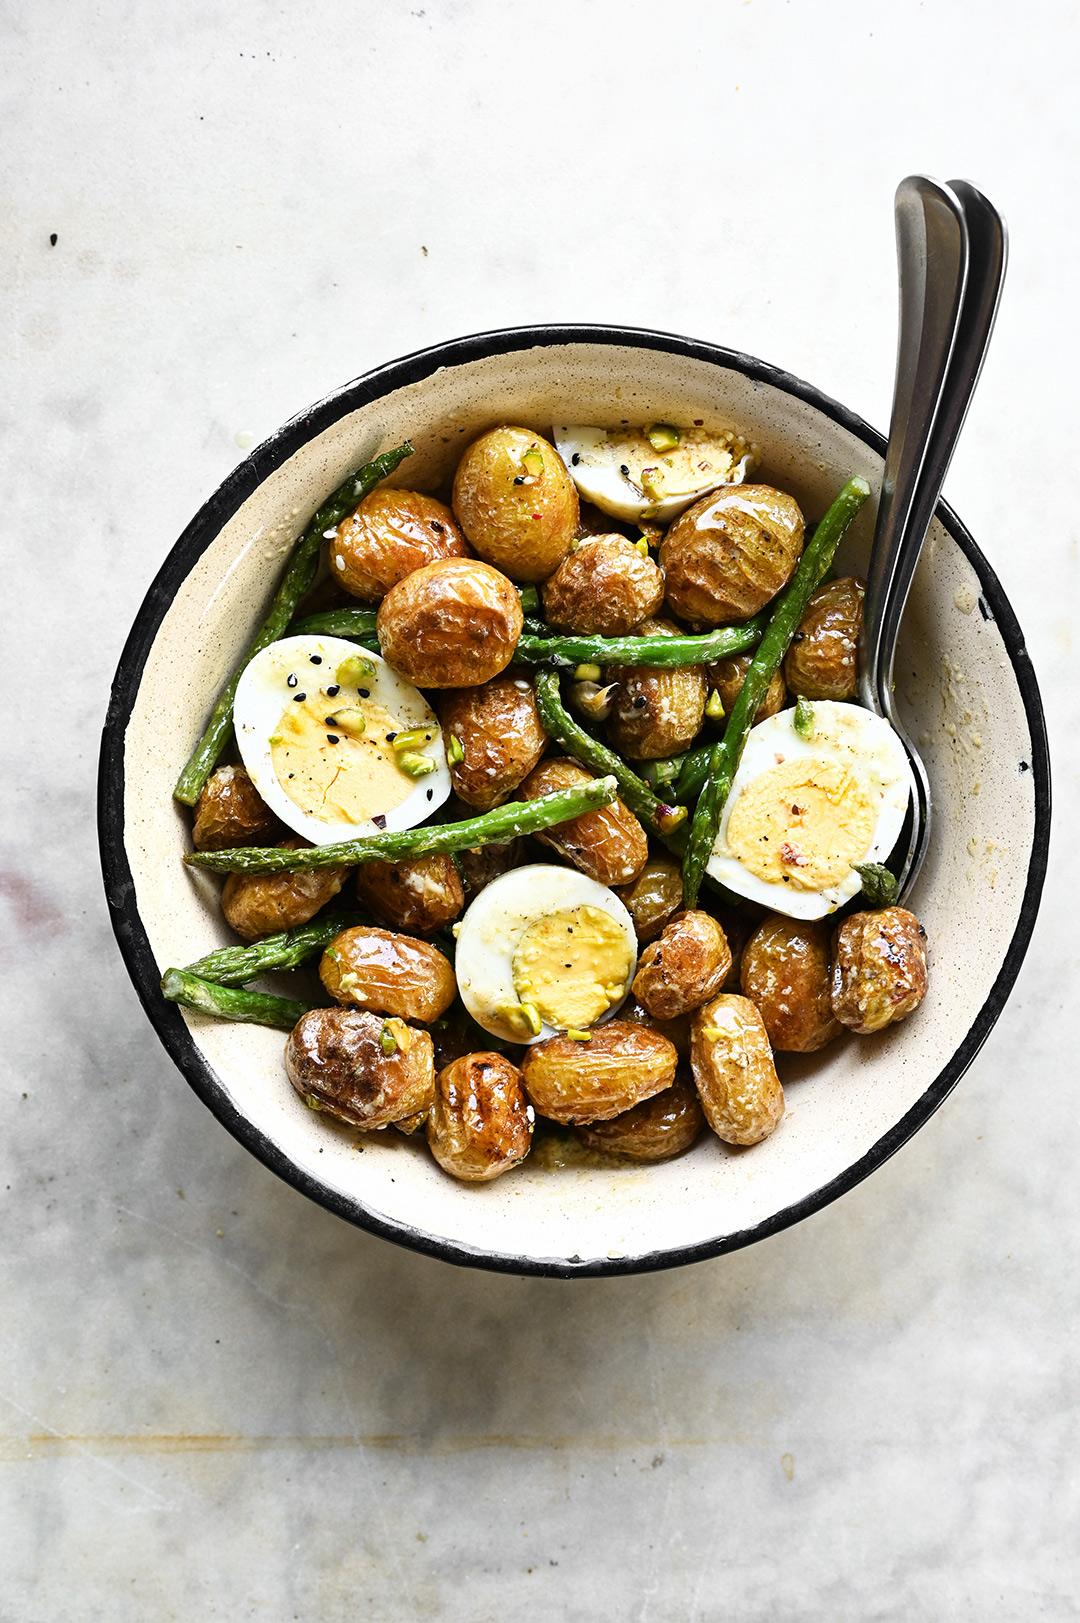 serving dumplings | Za'atar roasted potato and asparagus salad